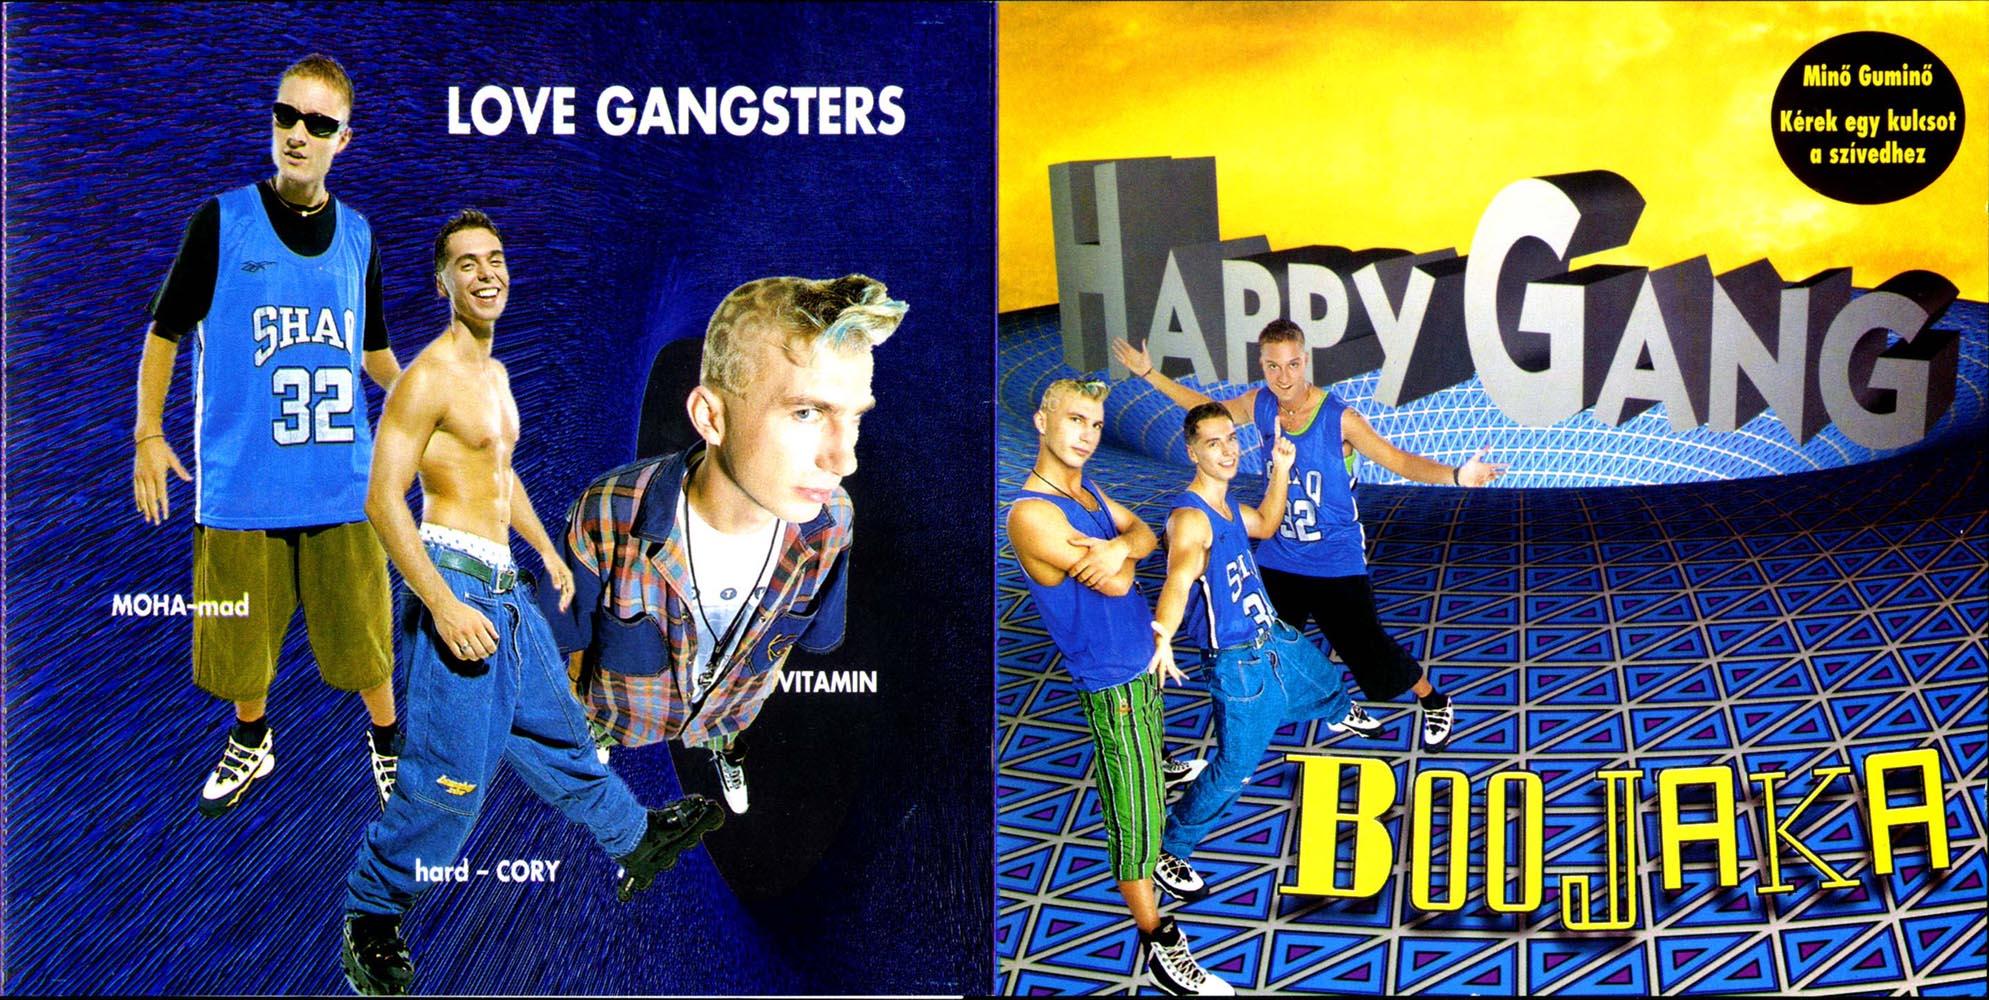 Happy Gang Boojaka